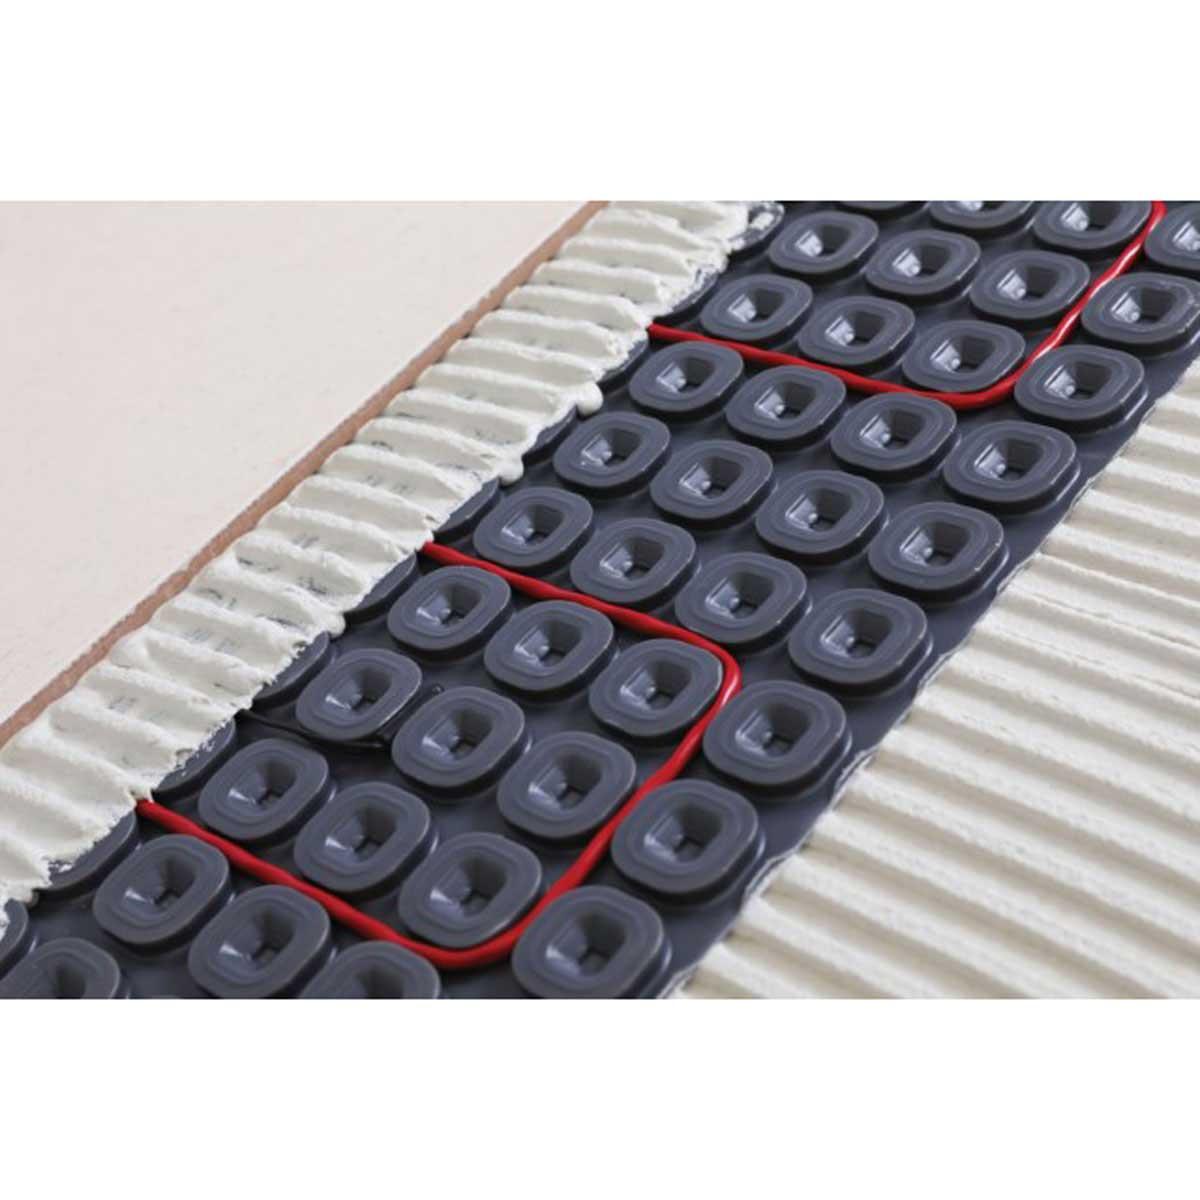 Nuheat Tile Uncoupling Heating